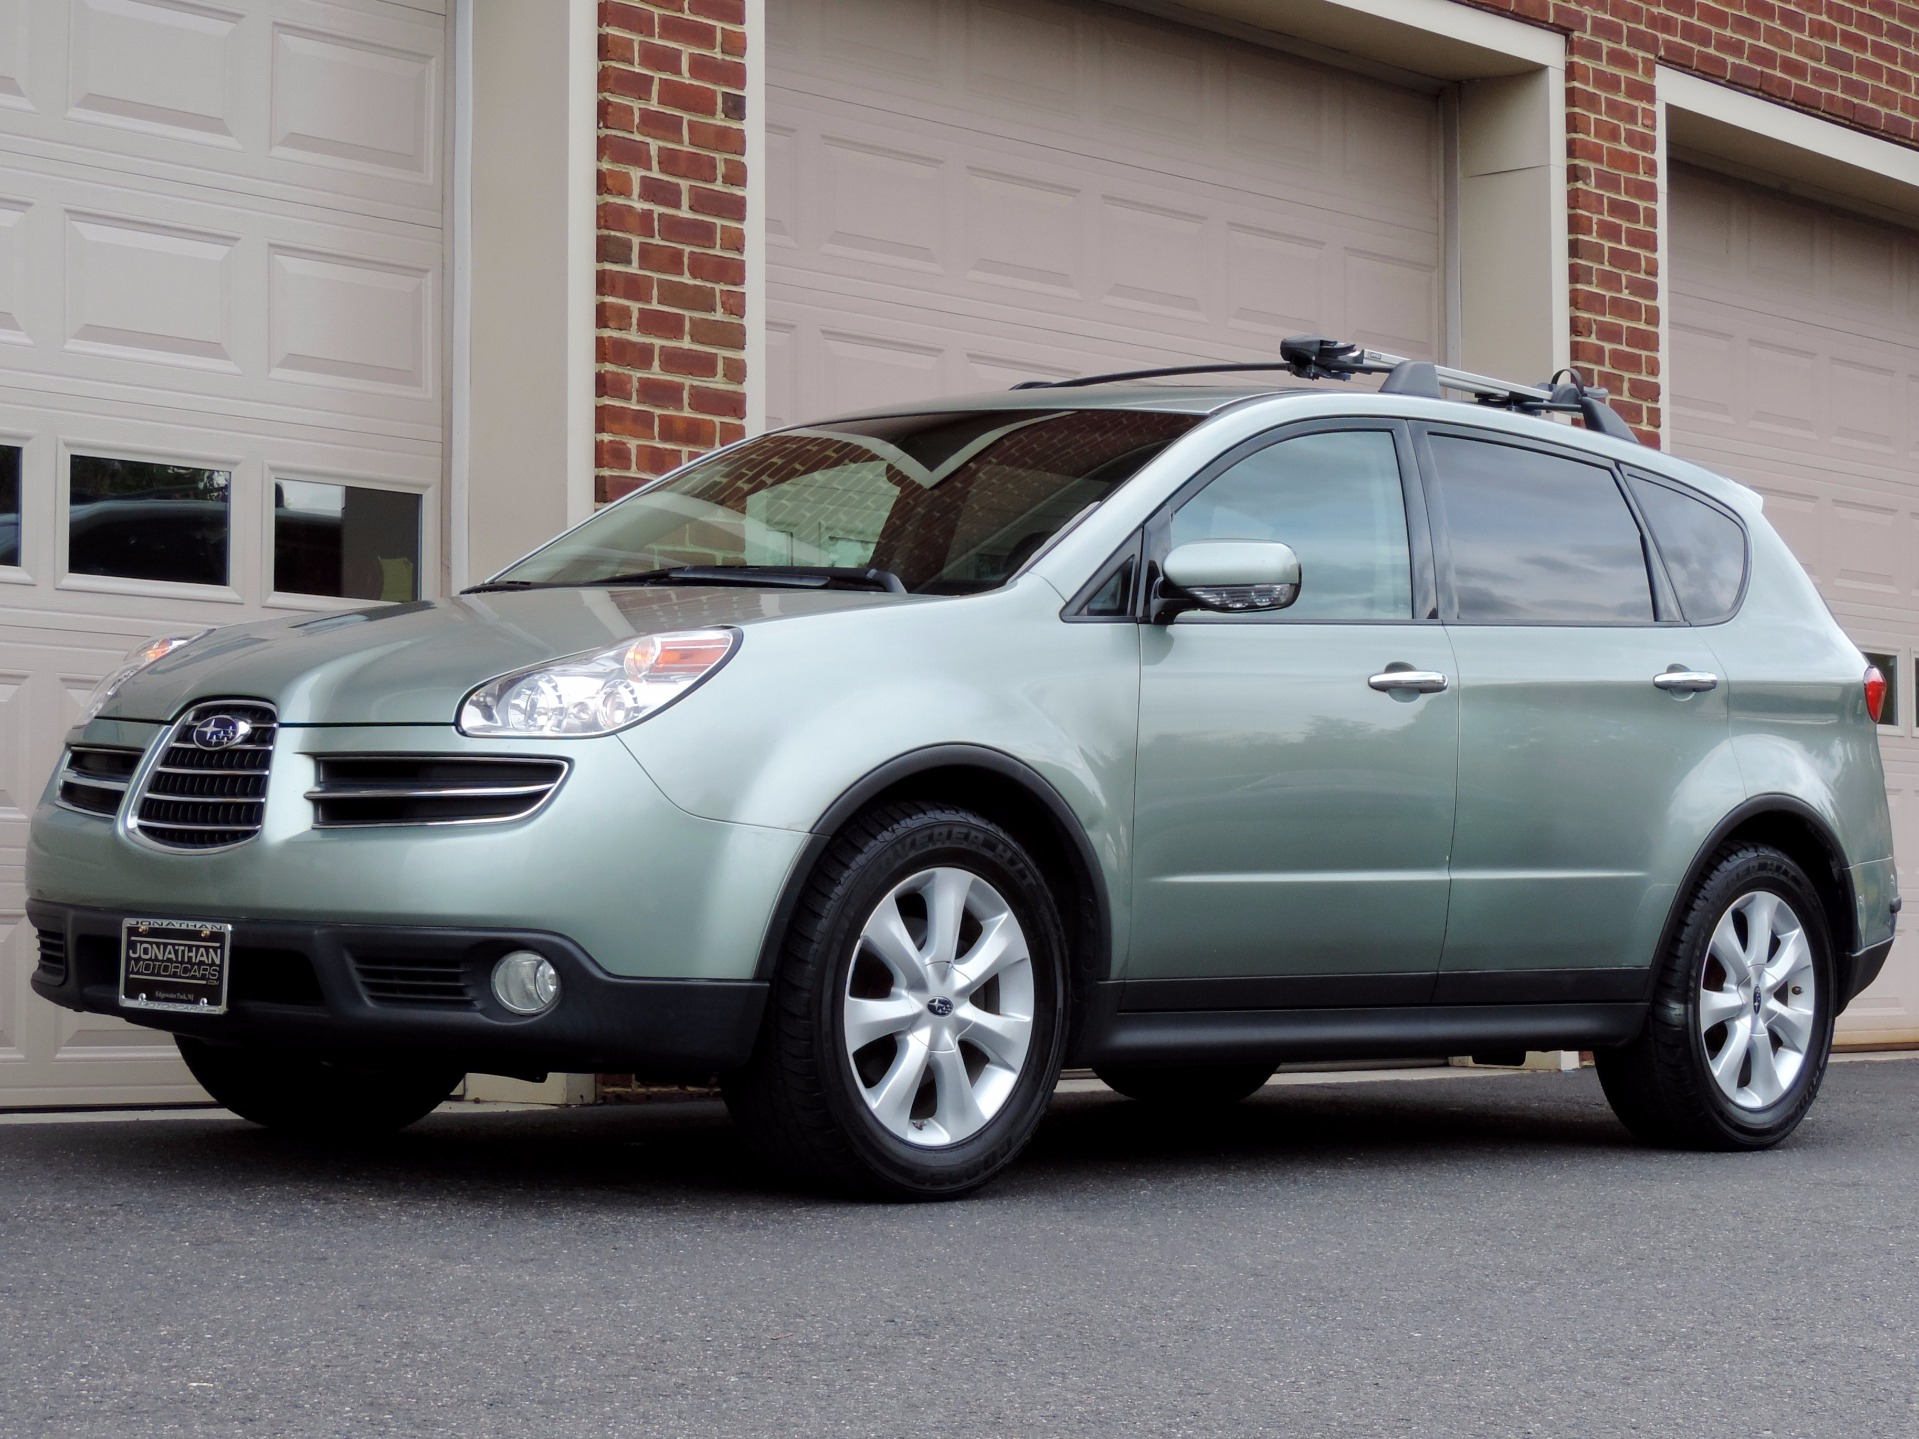 Subaru Of Keene >> Subaru 7 Passenger - 2018 - 2019 New Car Reviews by Language Kompis